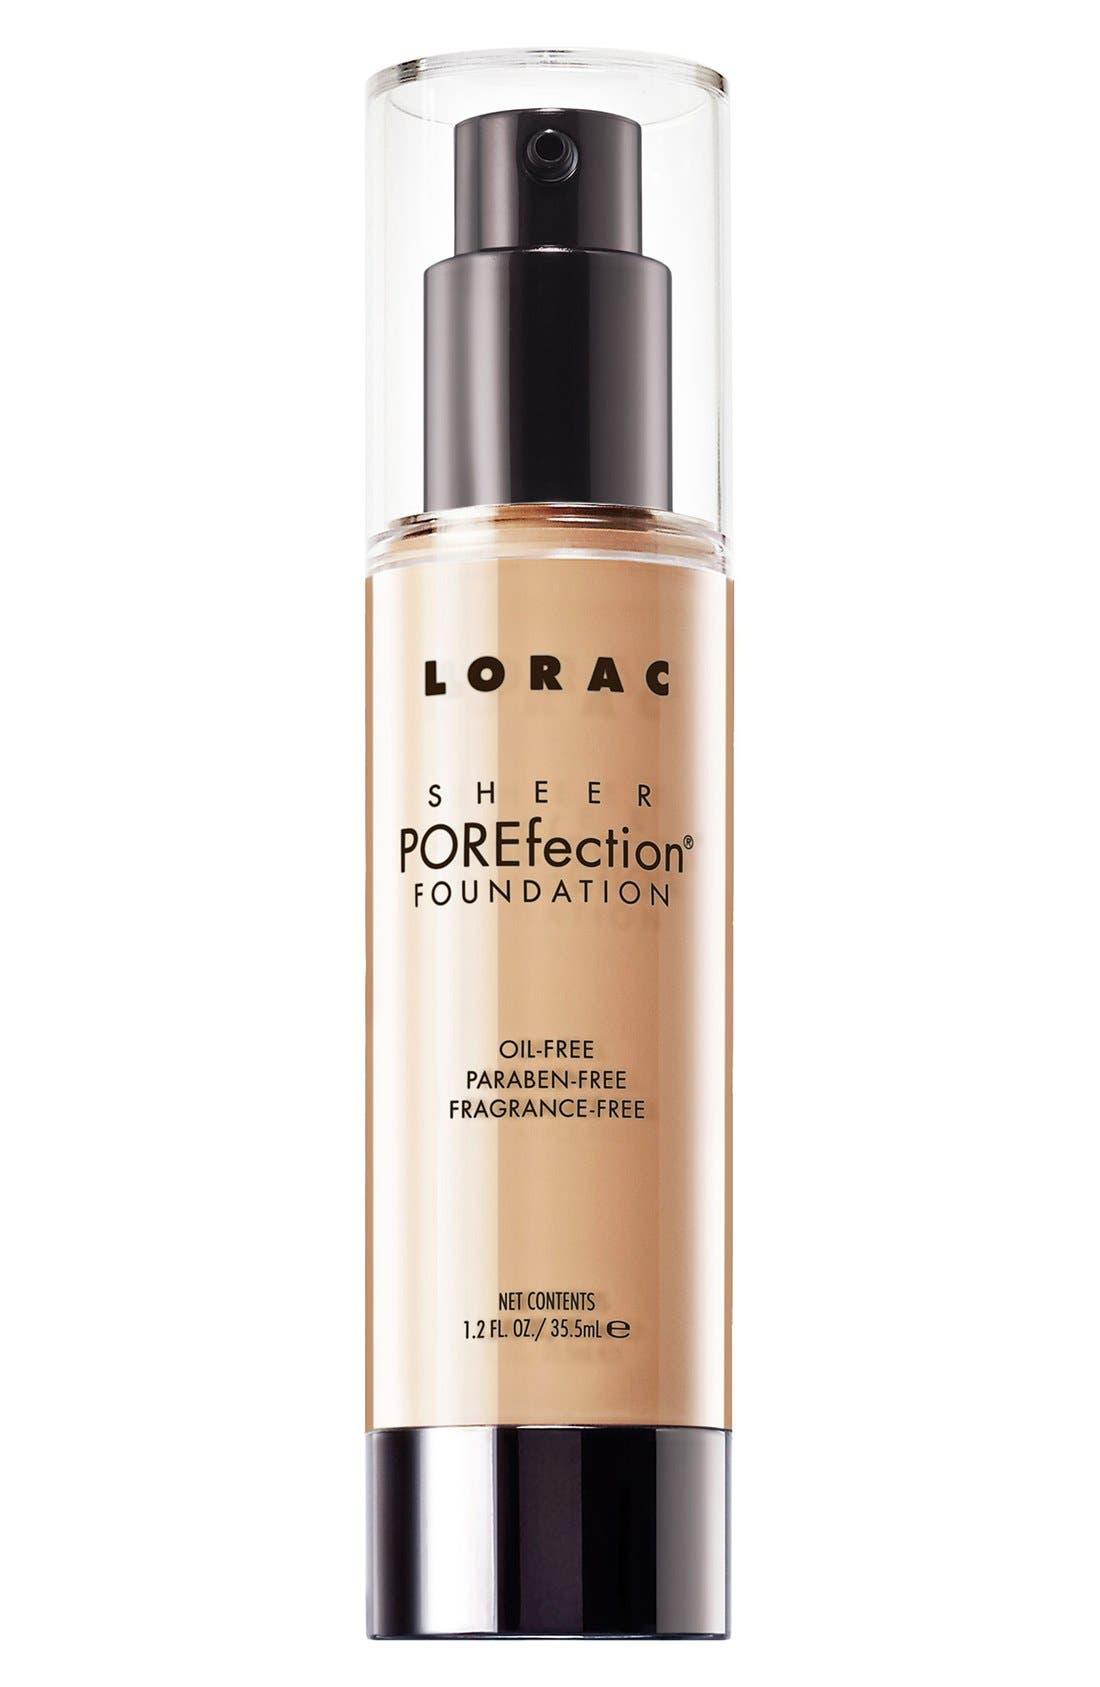 LORAC 'Sheer POREfection®' Foundation